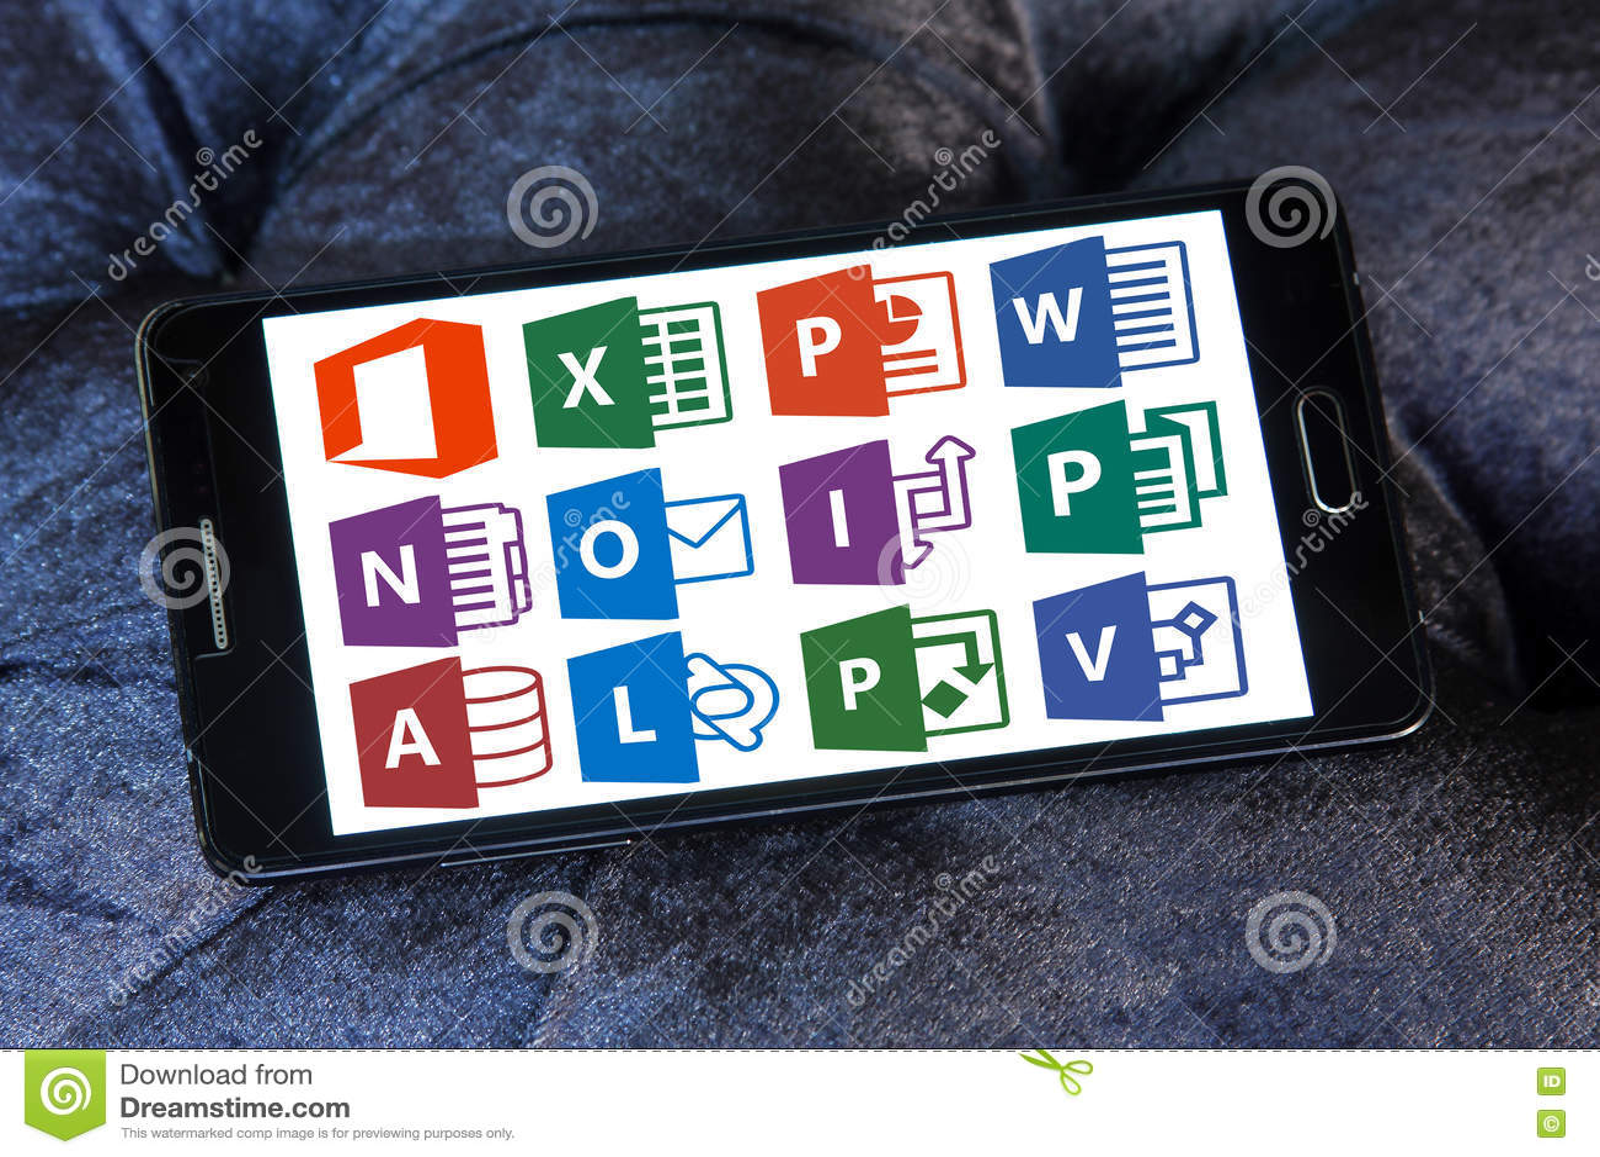 microsoft office company. Microsoft Office Icons And Logos Company